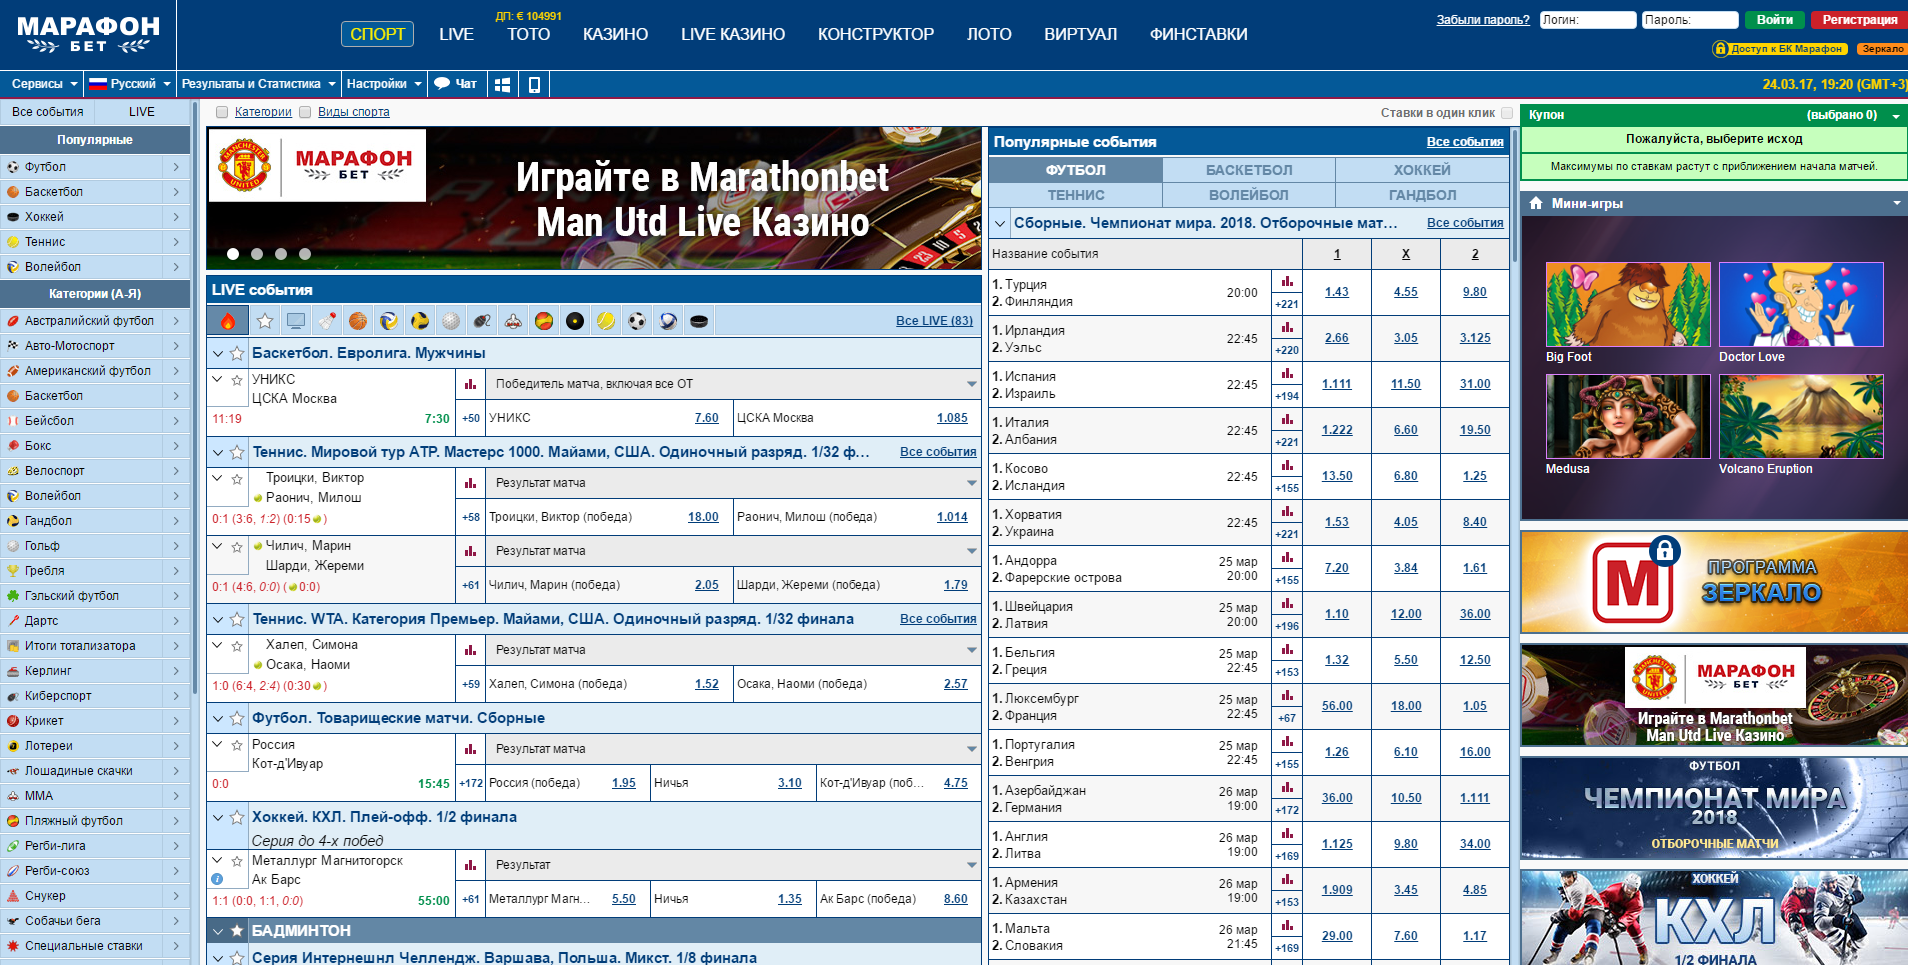 Campeonato Piauiense - First Stage рекомендации